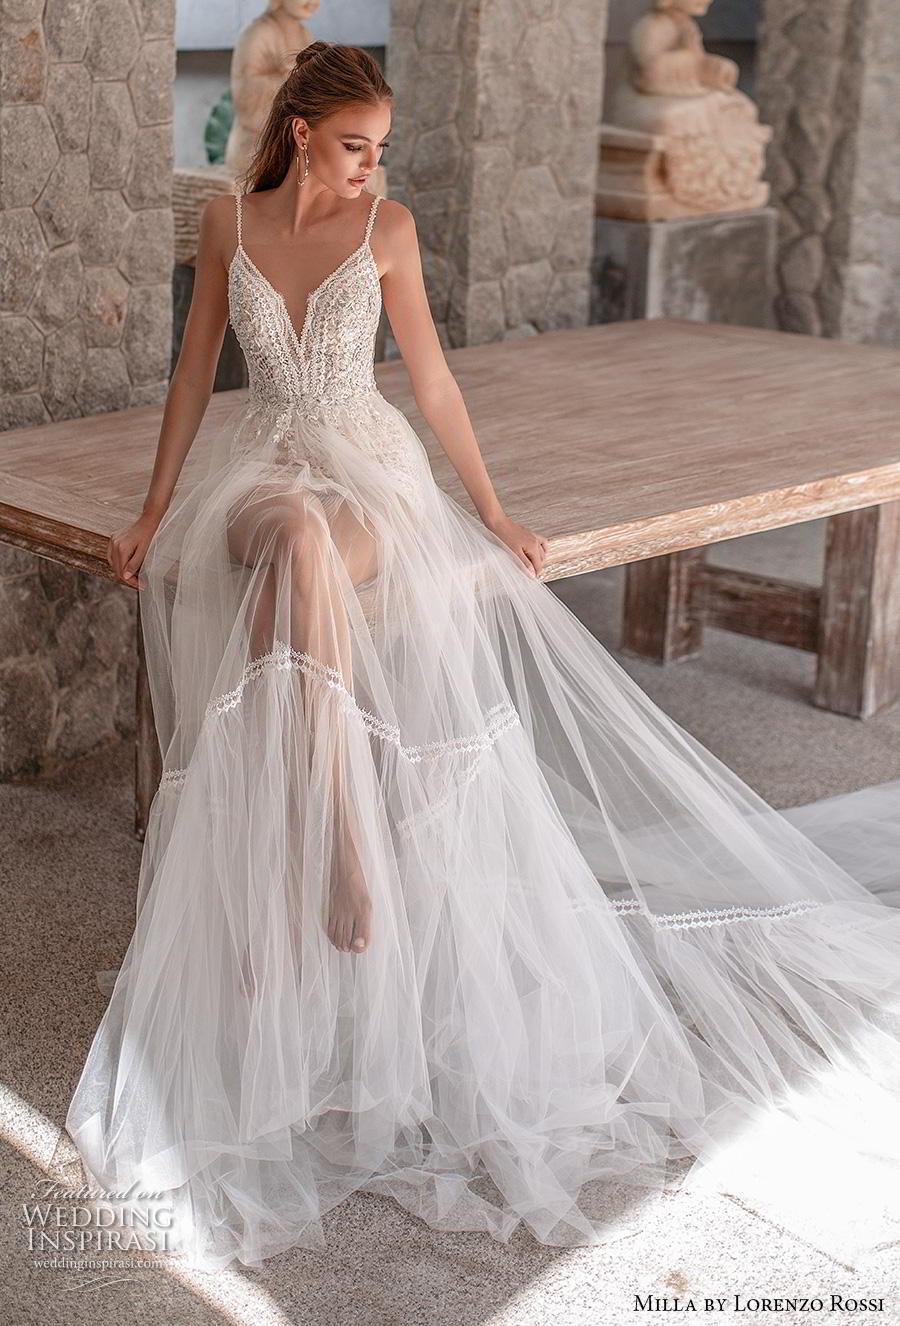 lorenzo rossi 2019 milla bridal sleeveless spaghetti strap deep diamond neckline heavily embellished bodice sheer skirt romantic soft a  line wedding dress low v back chapel train (13) mv